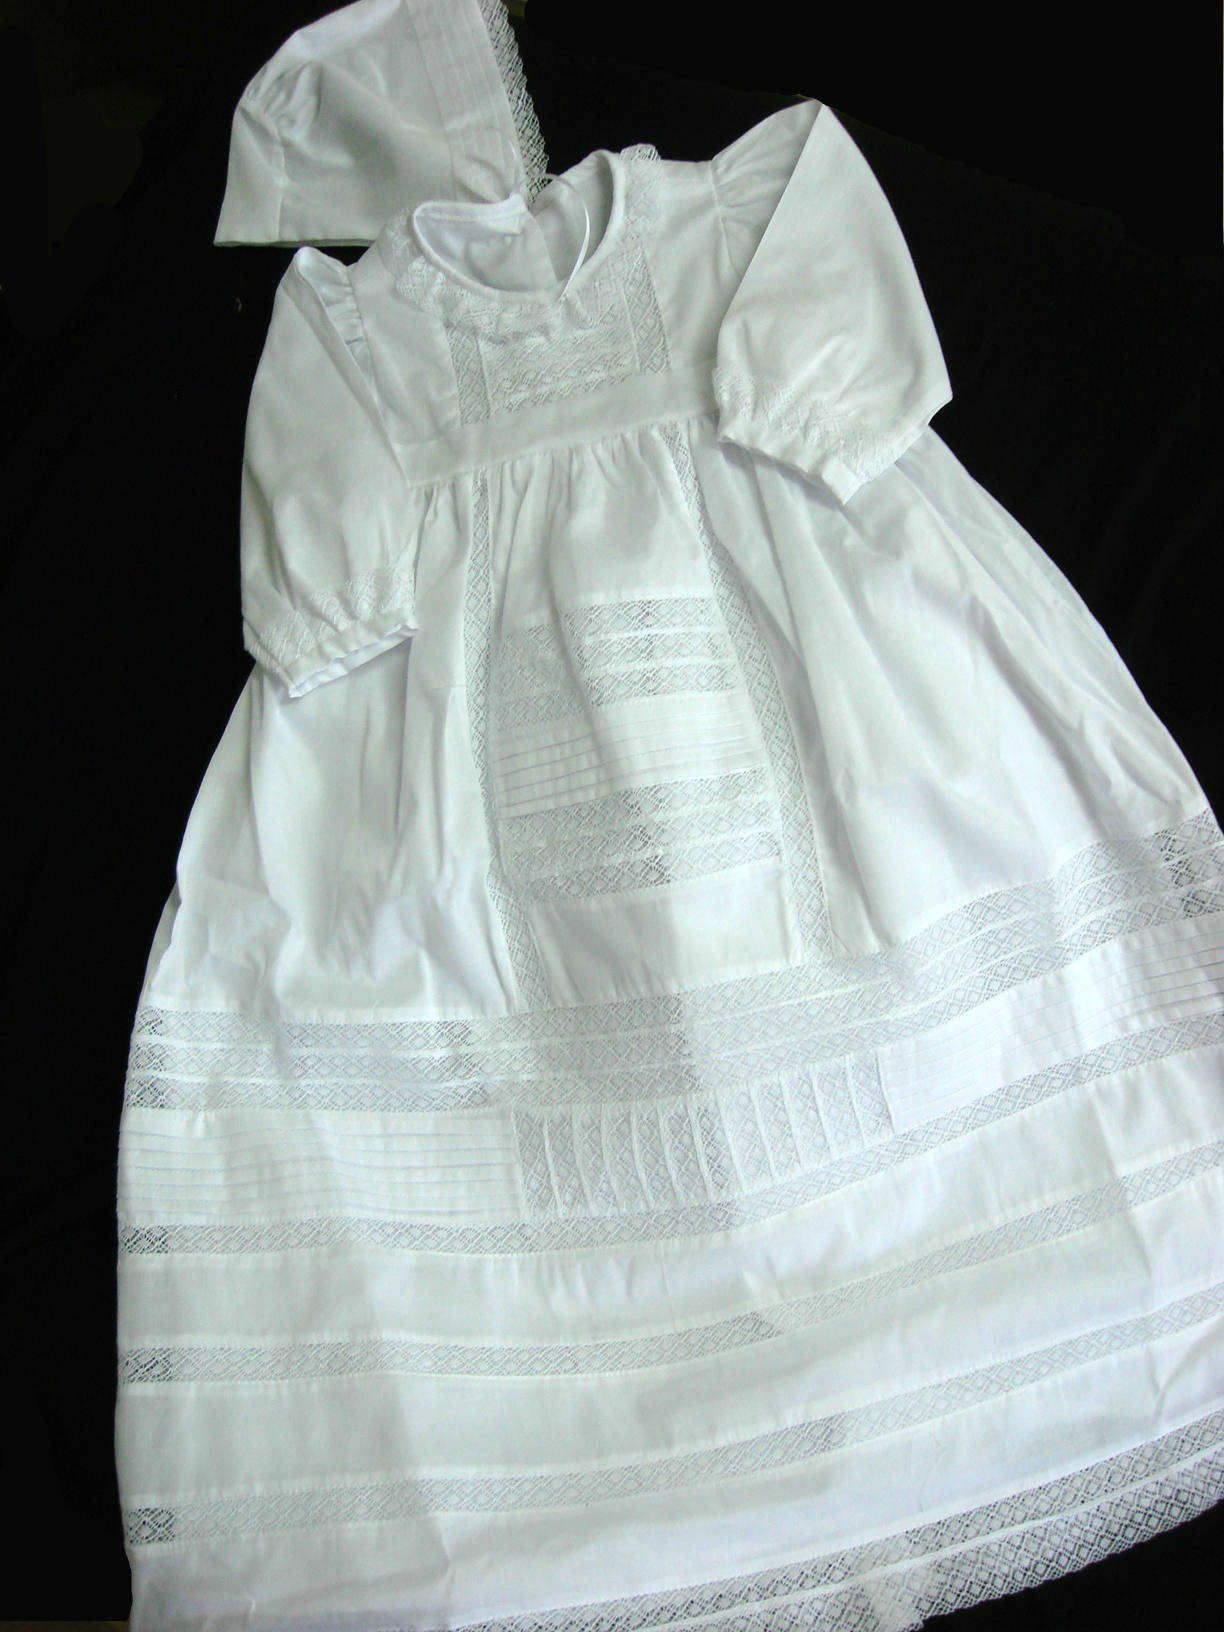 Mandriao Camisola Realeza Batizado